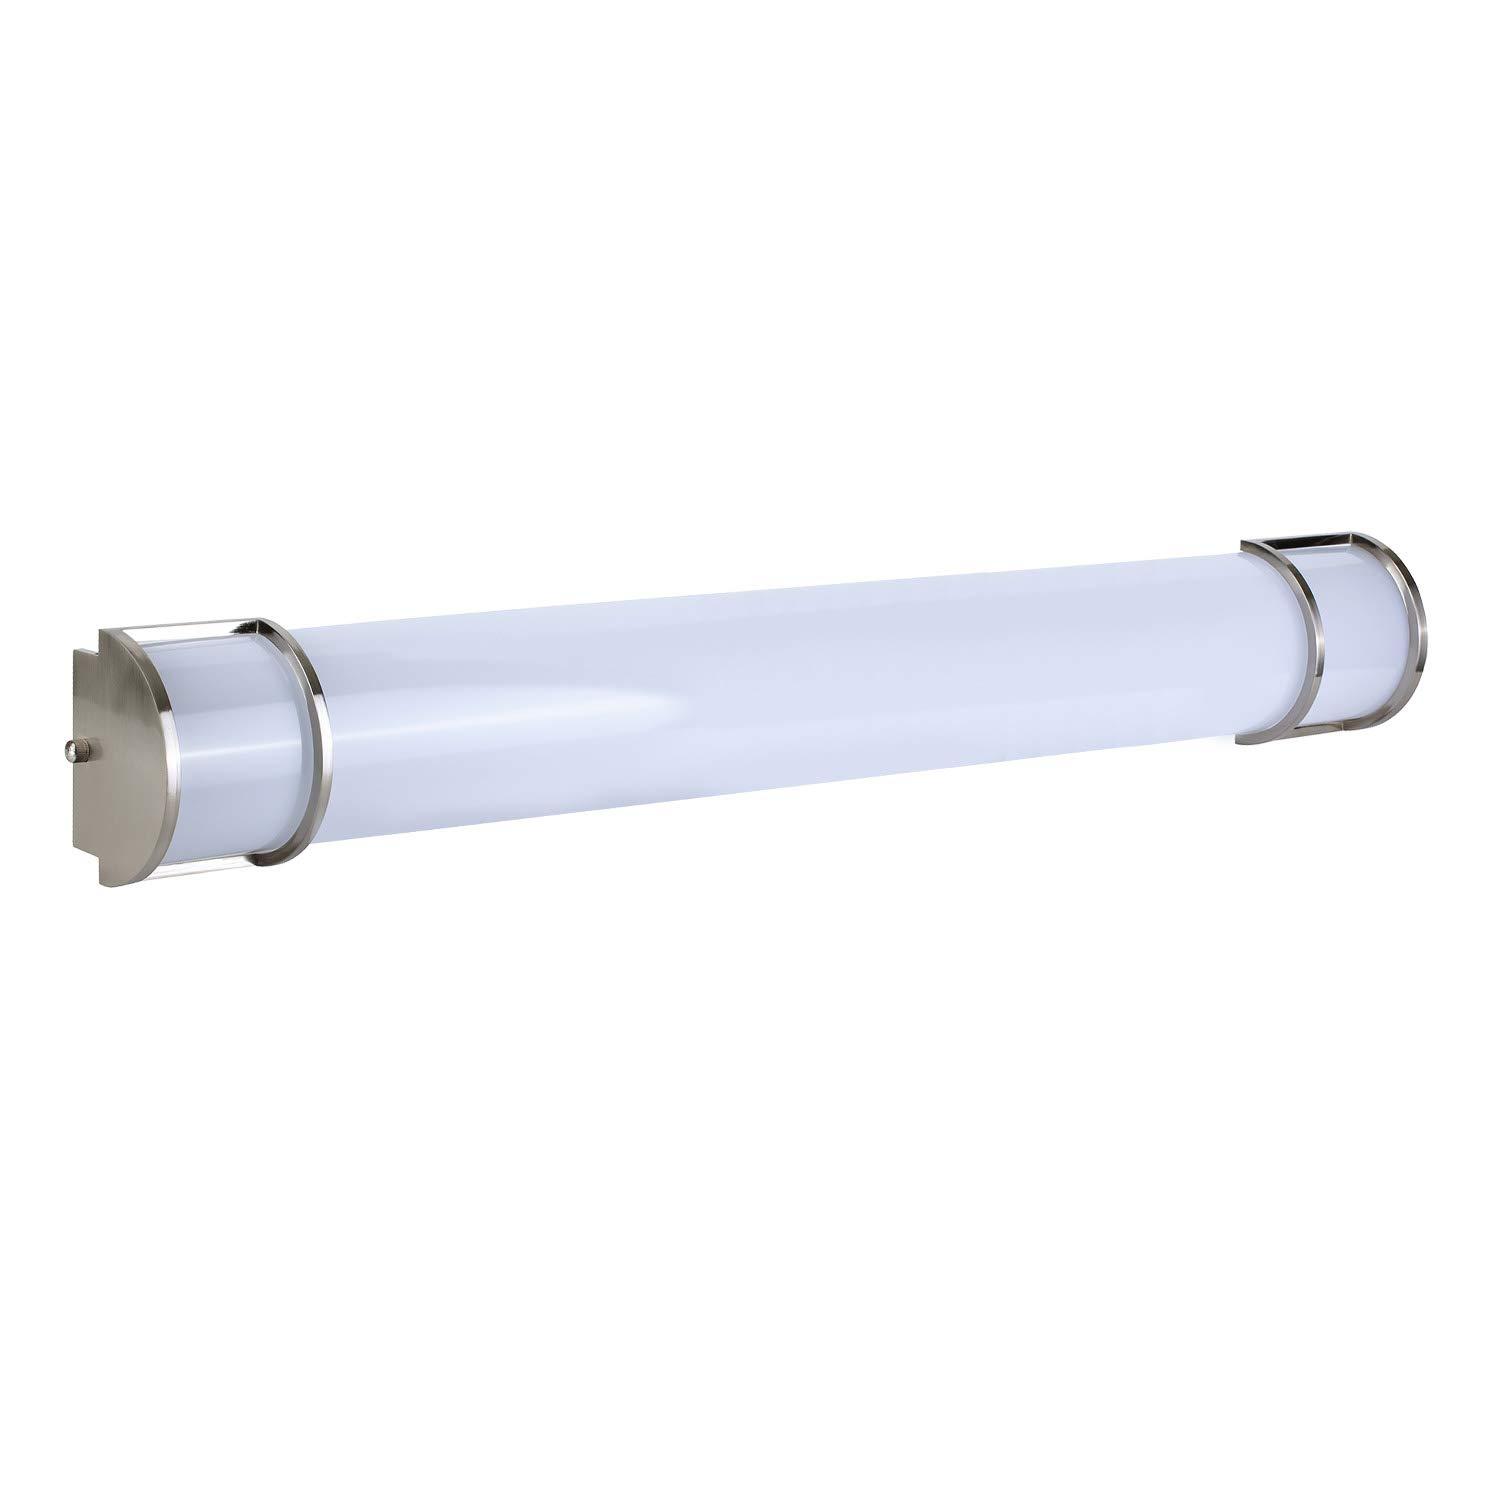 OSTWIN 48 Vanity Light Fixture Brushed Nickel, Led Vanity Lighting 35W 5000K Daylight, Large Size, Vertical or Horizontal Tube, Brushed Nickel Finish, ETL Energy Star Listed